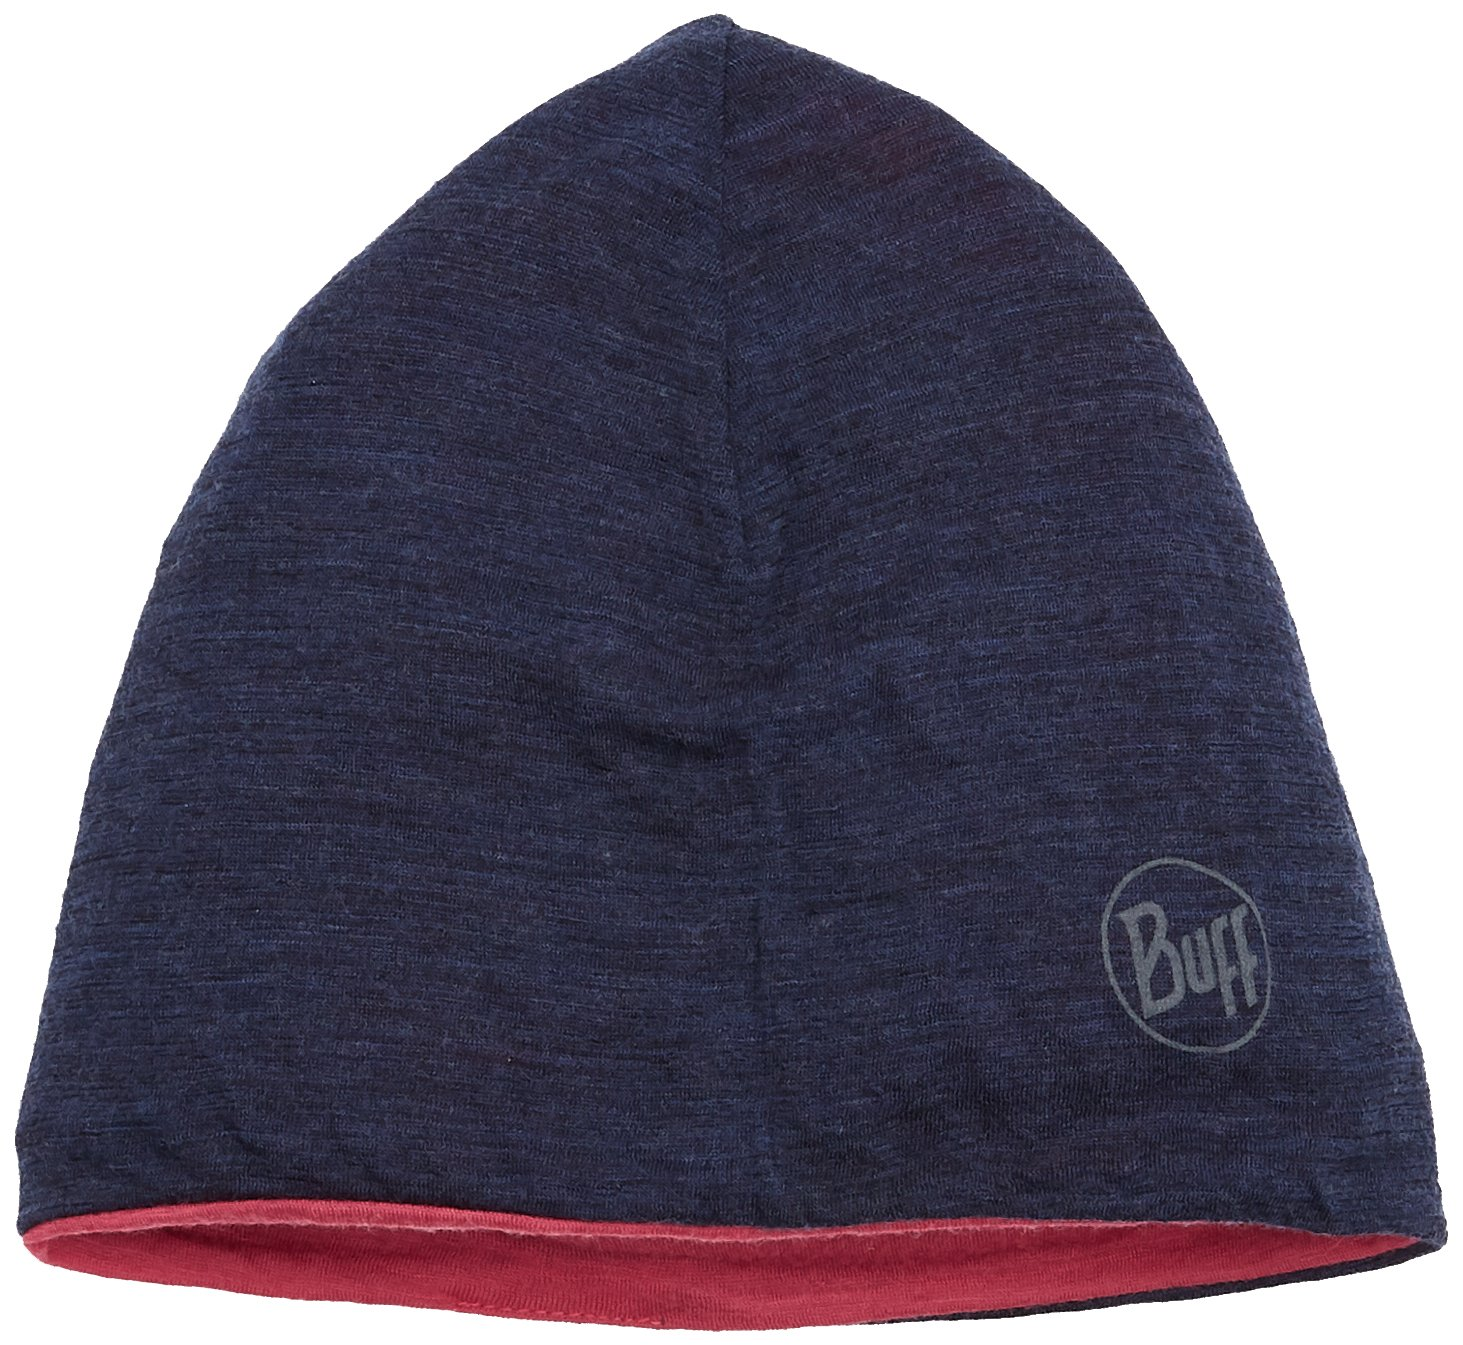 Buff Children s Lightweight Reversible Merino Wool Hat Cap 2d3206f39f62